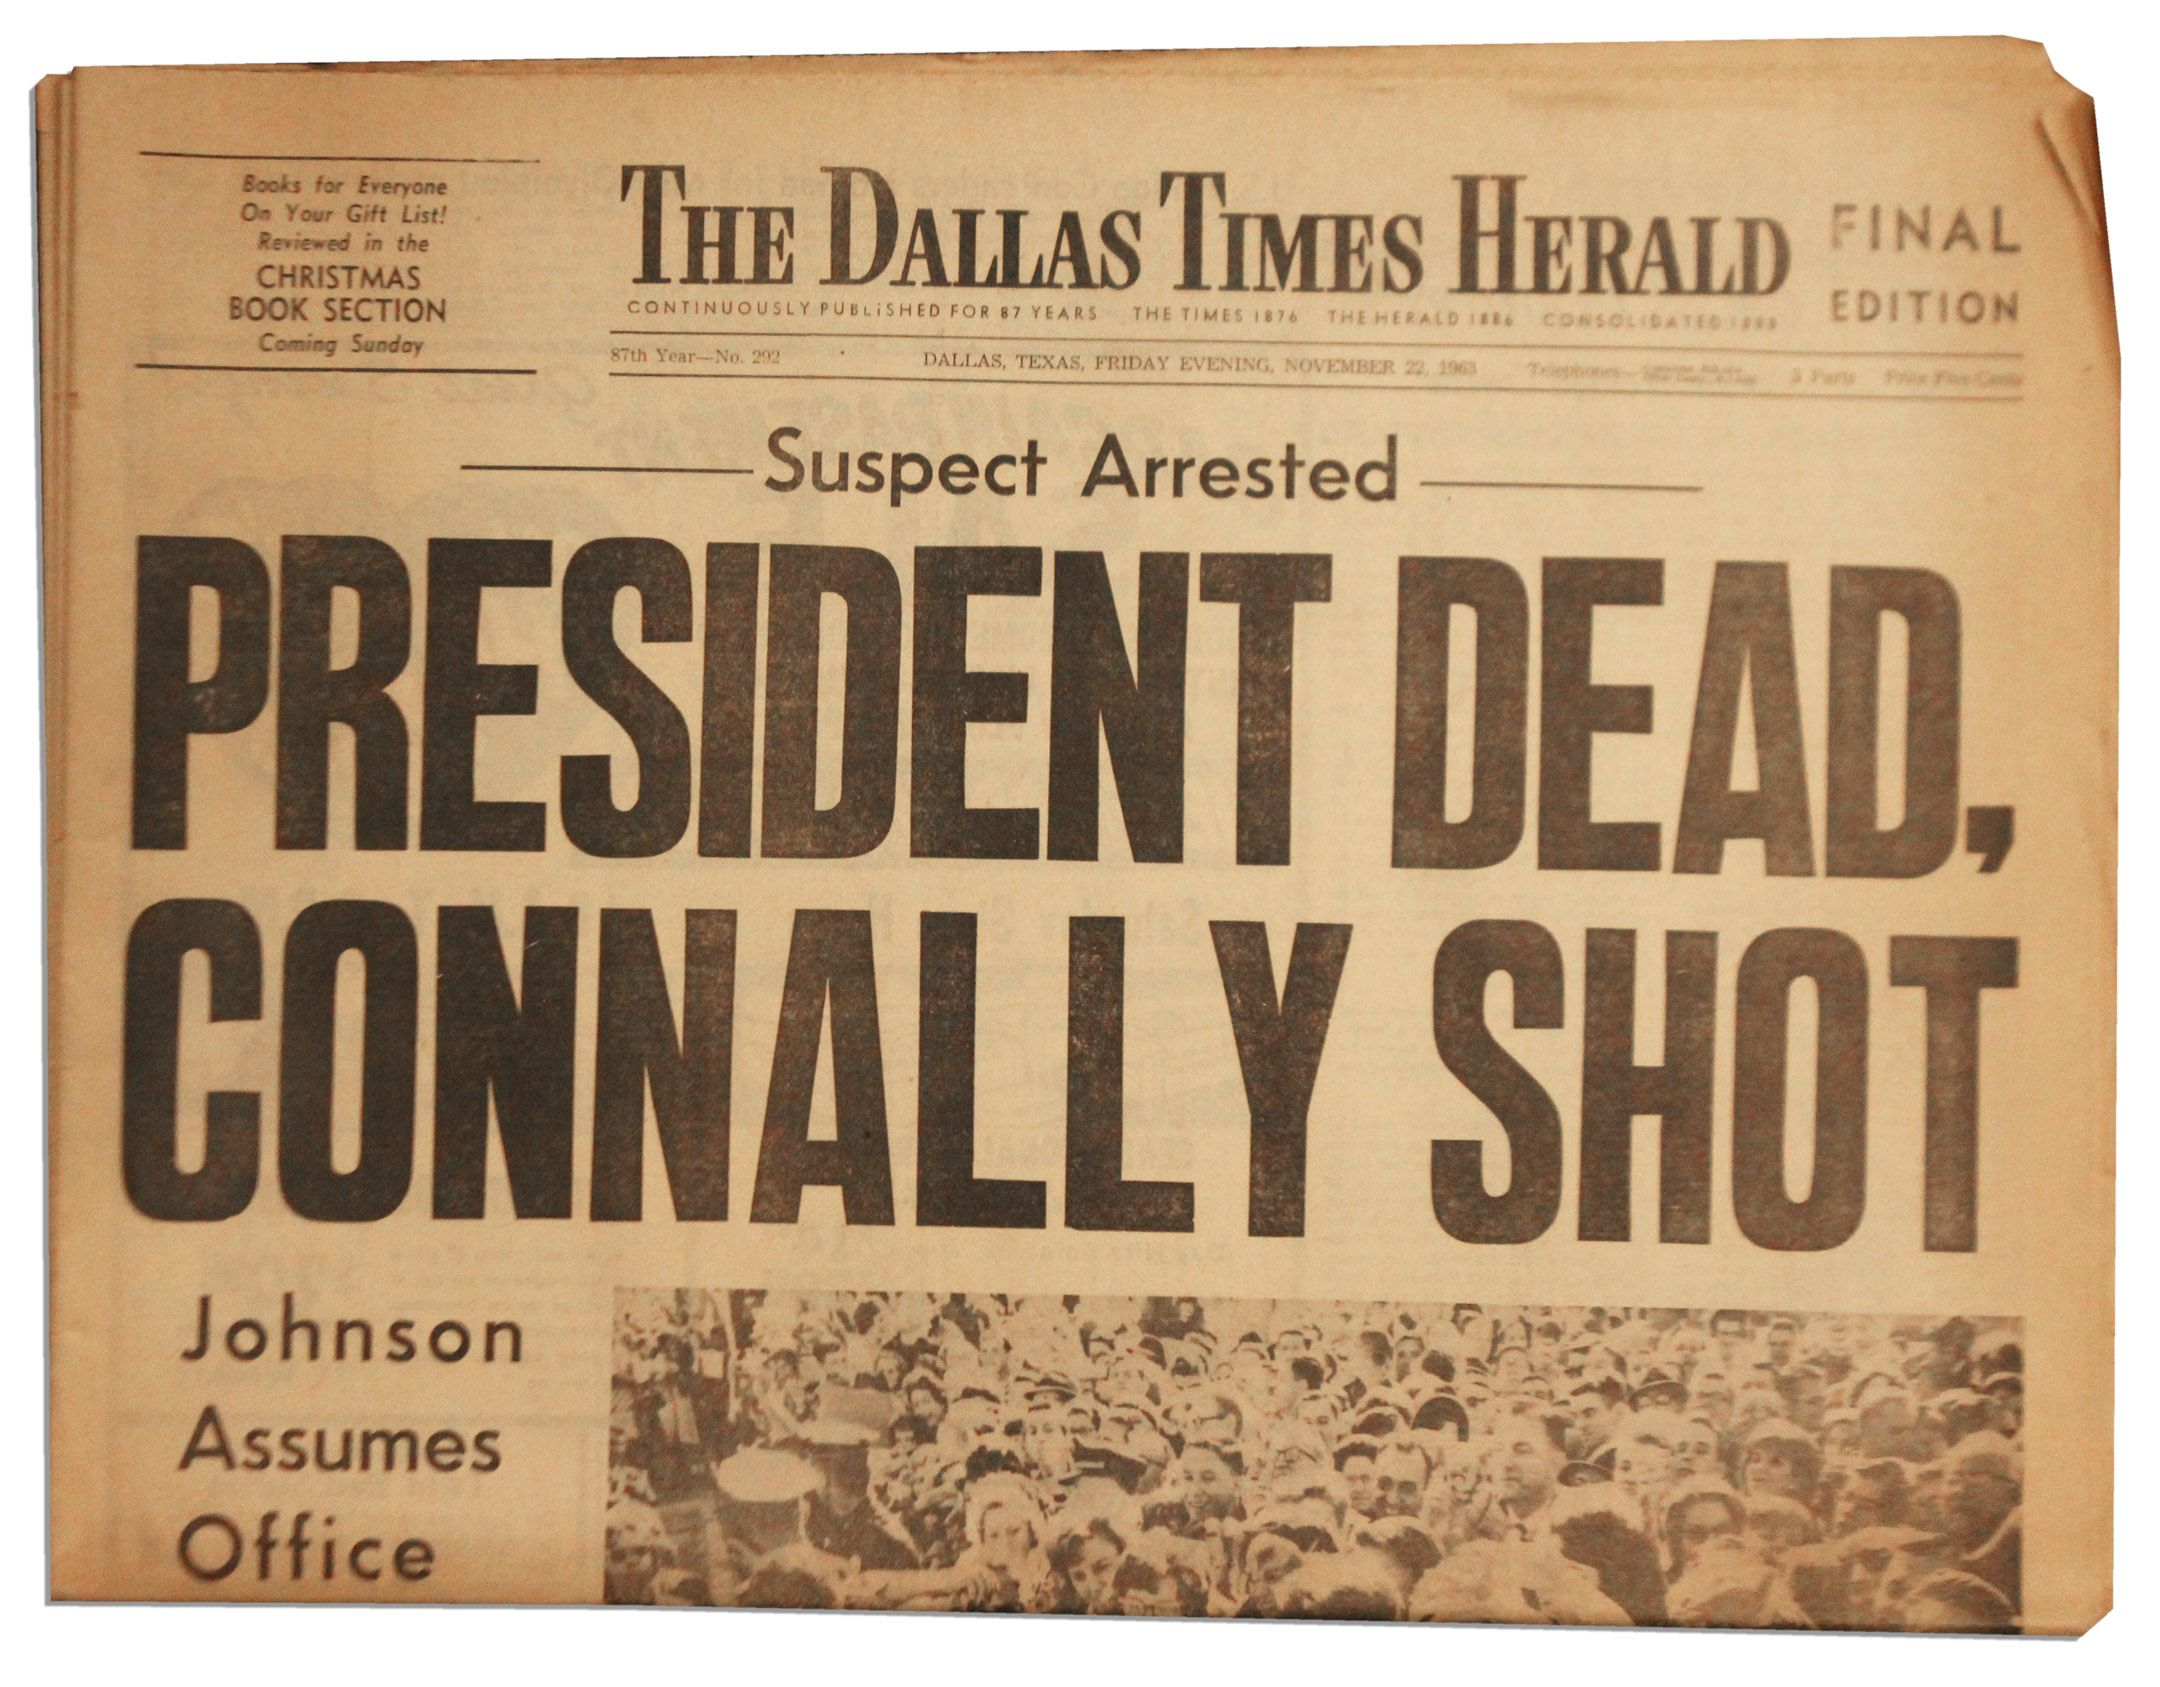 JFK Assassination Paper!?